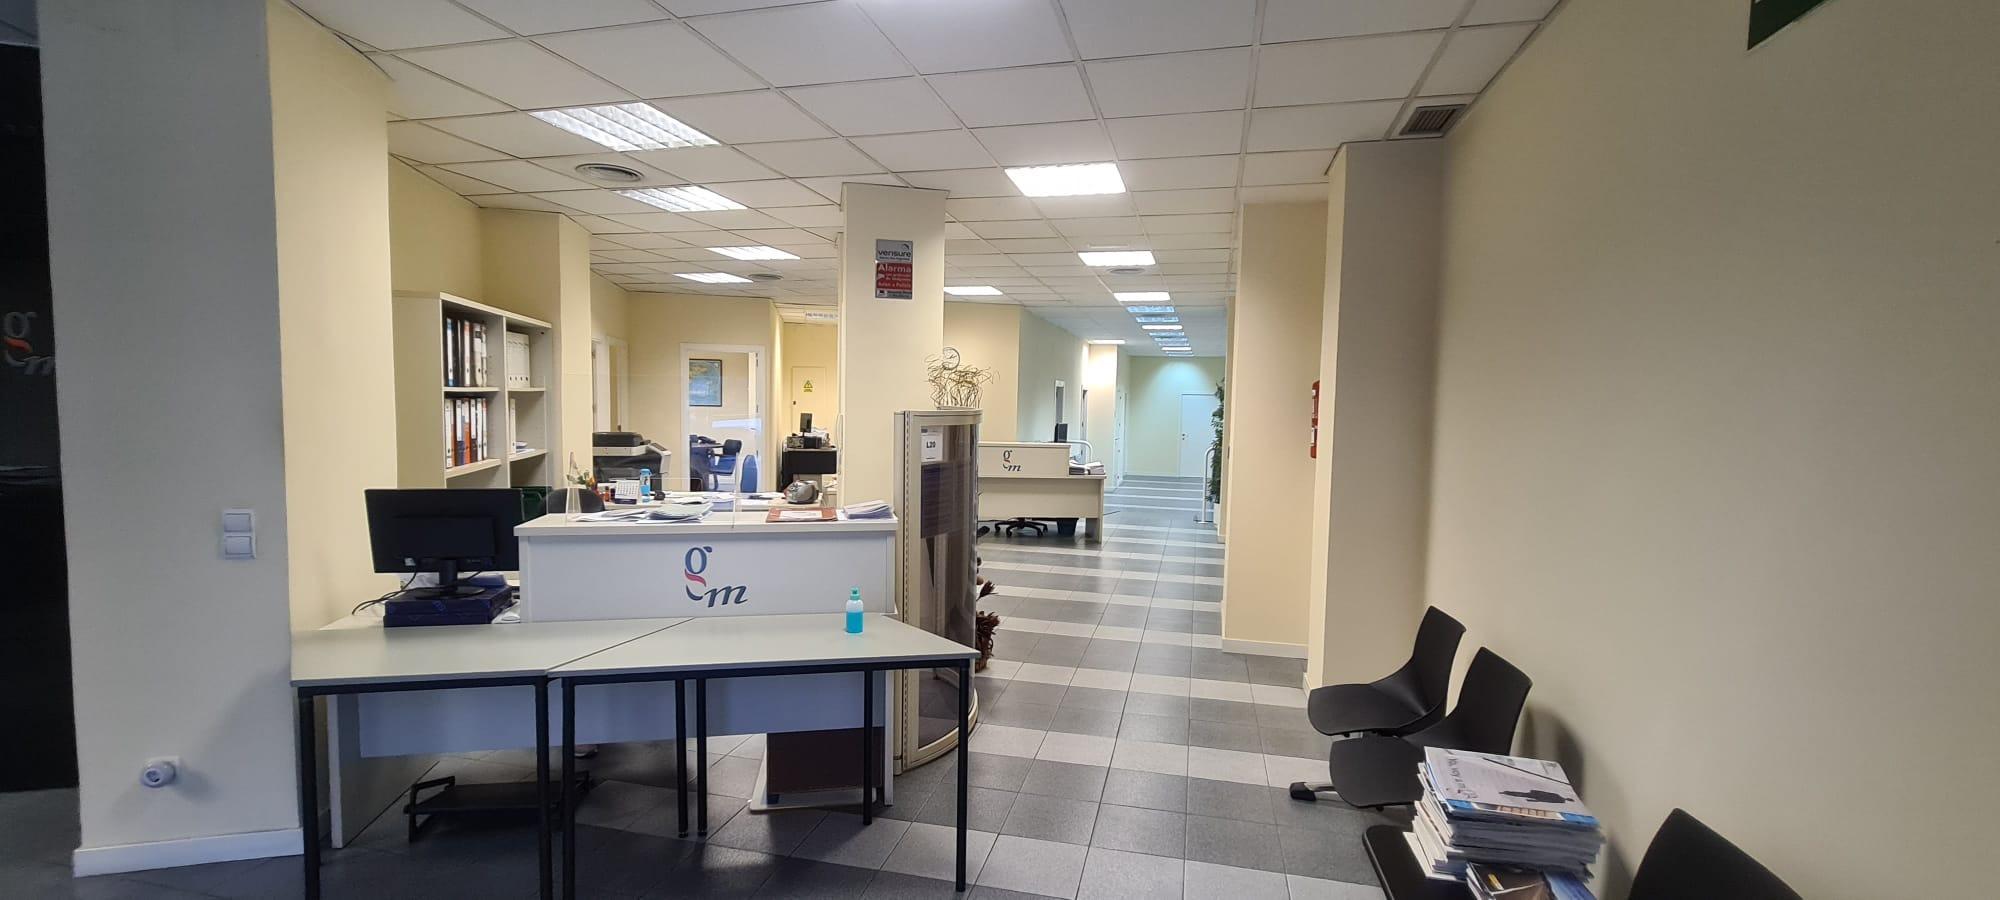 Local  Oficina Santa Mª de la Cabeza